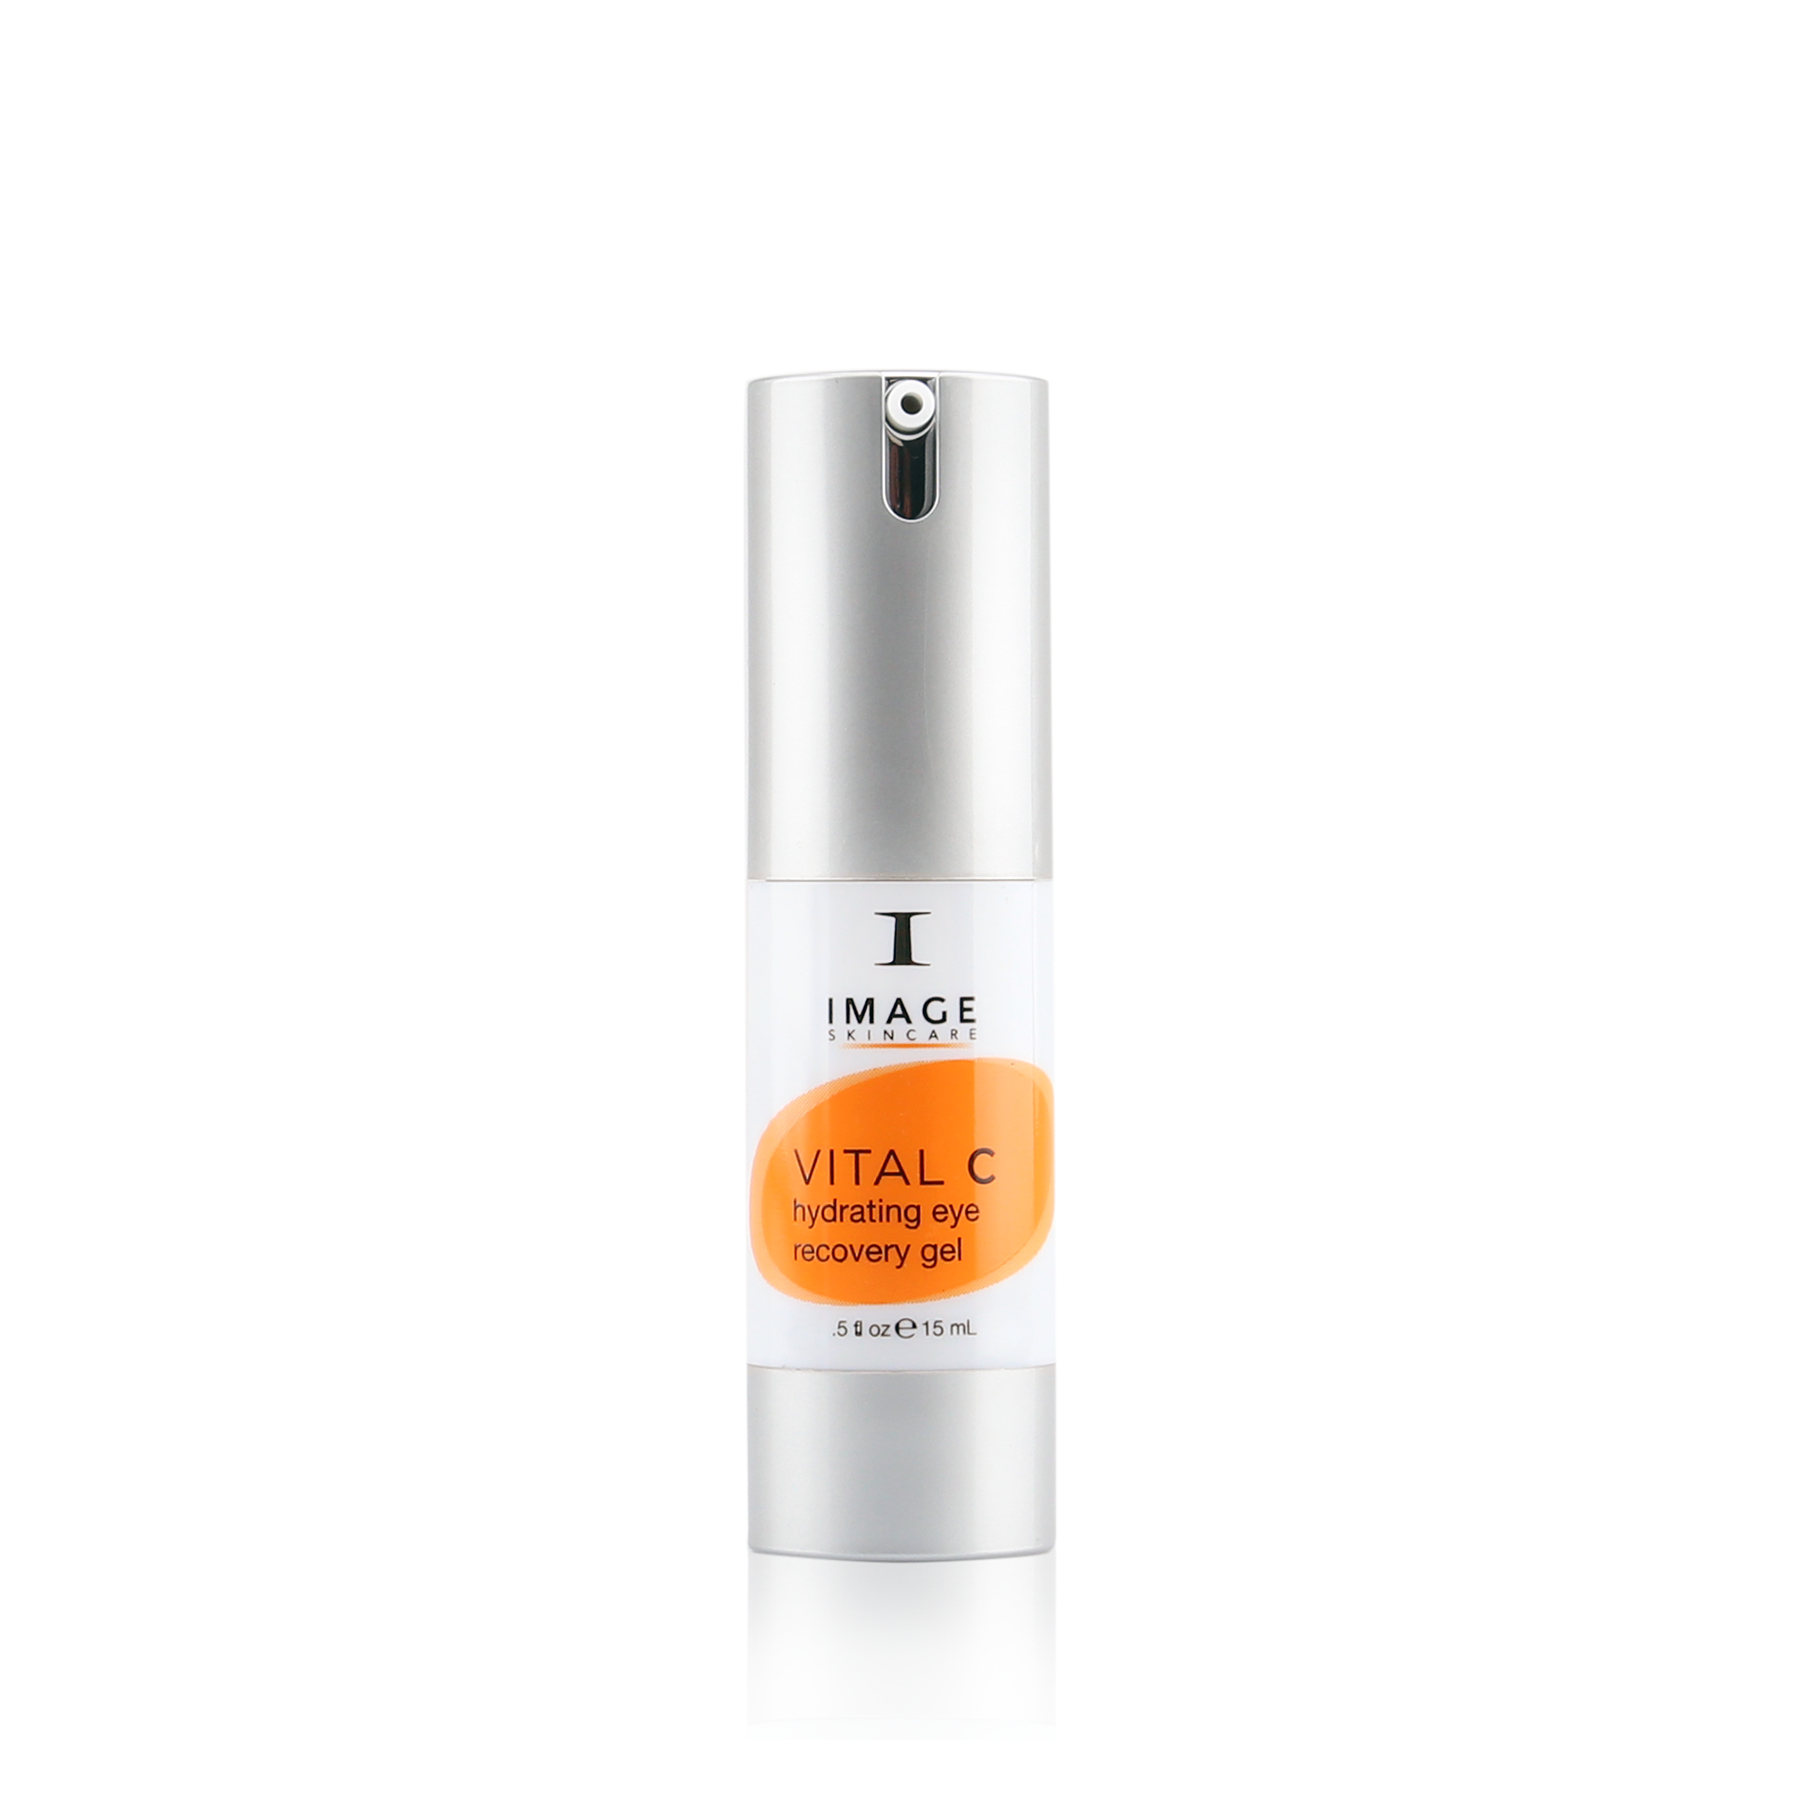 Image Skincare VITAL C Hydrating Eye Recovery Gel